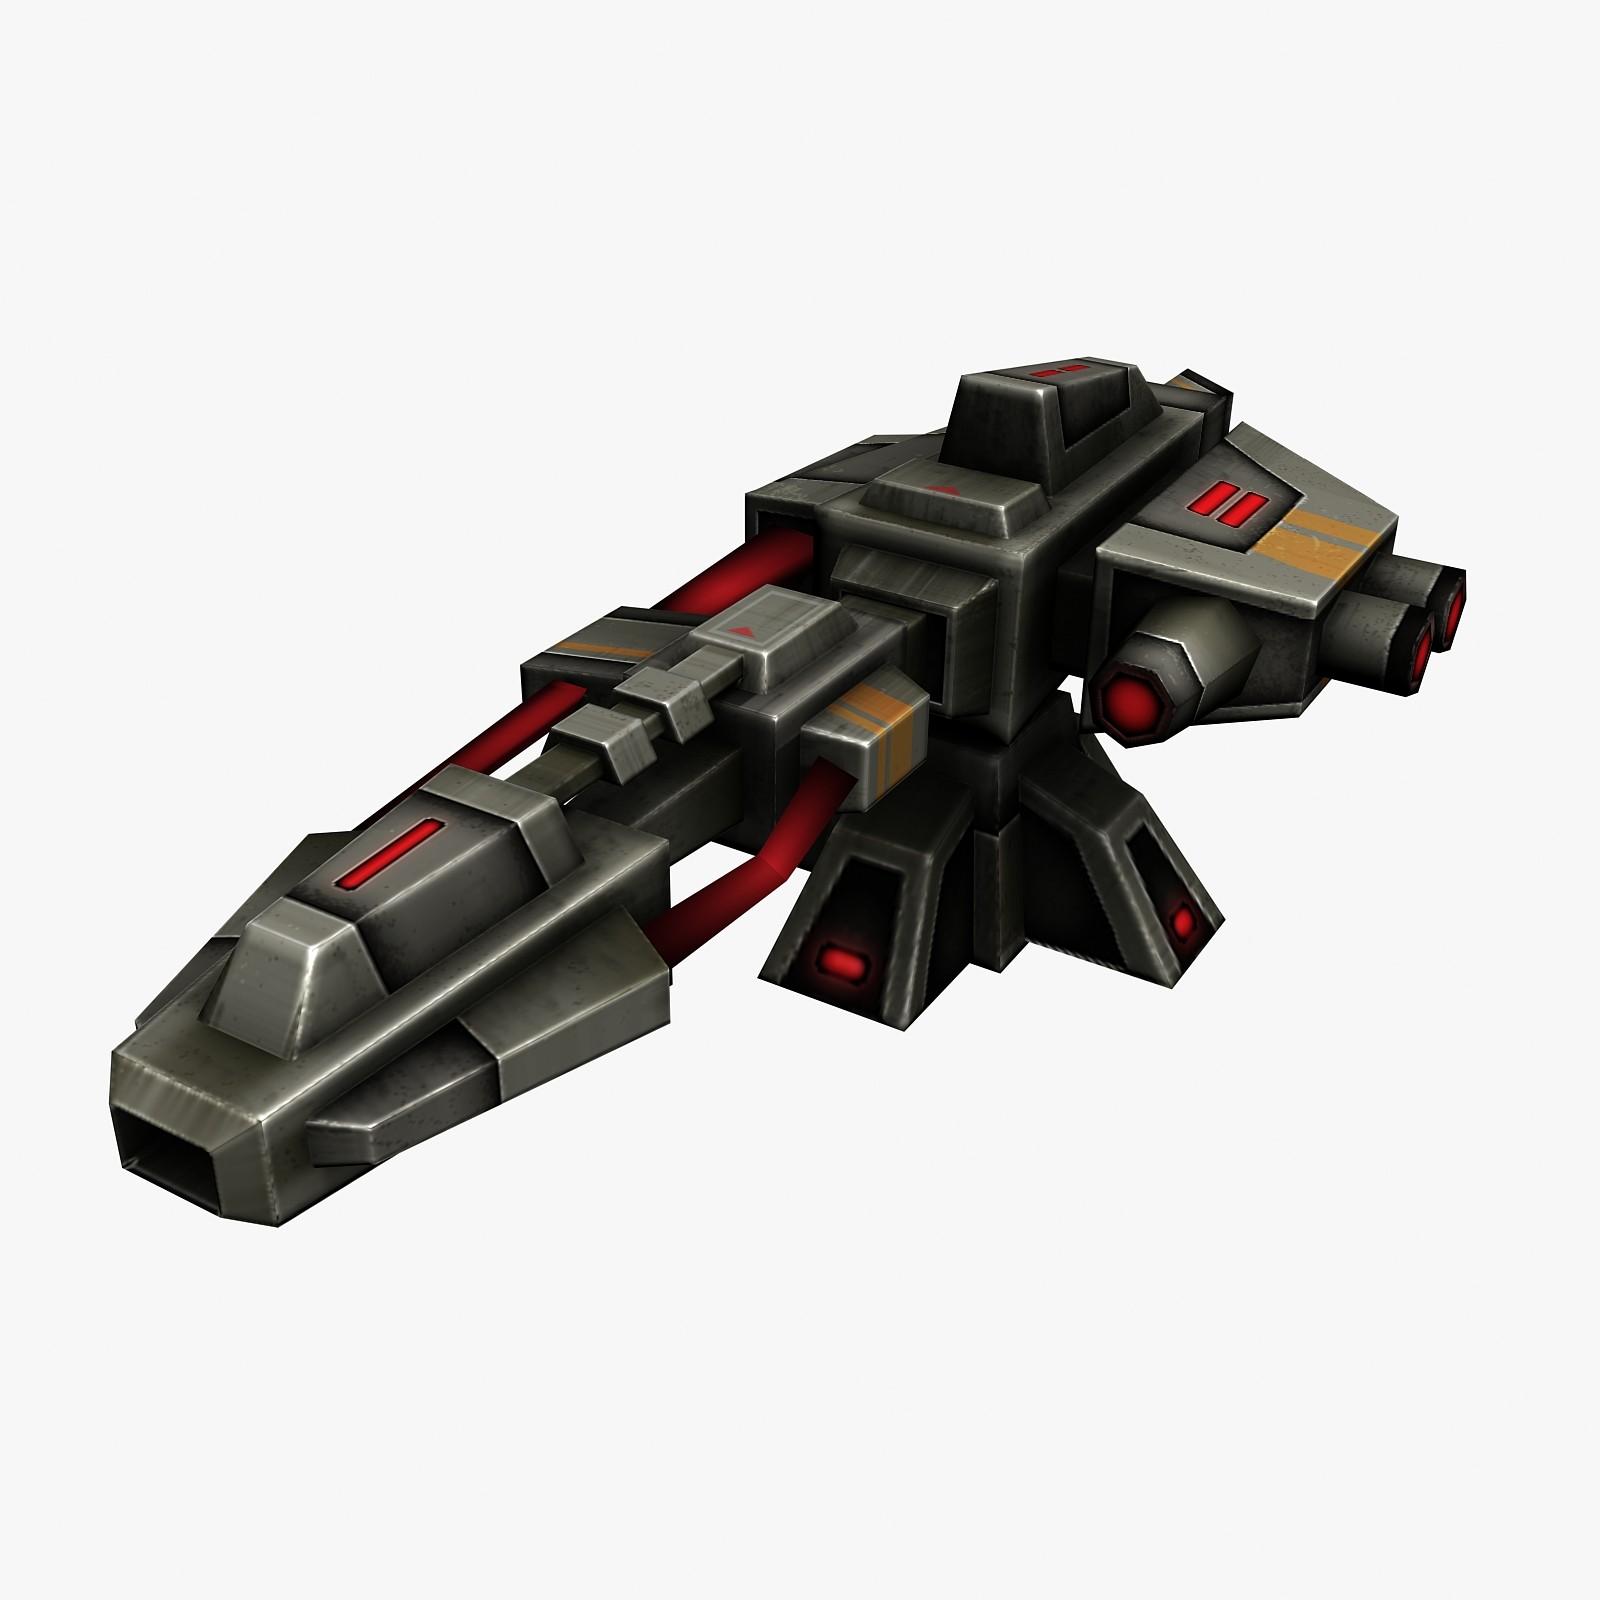 3d energy weapon model